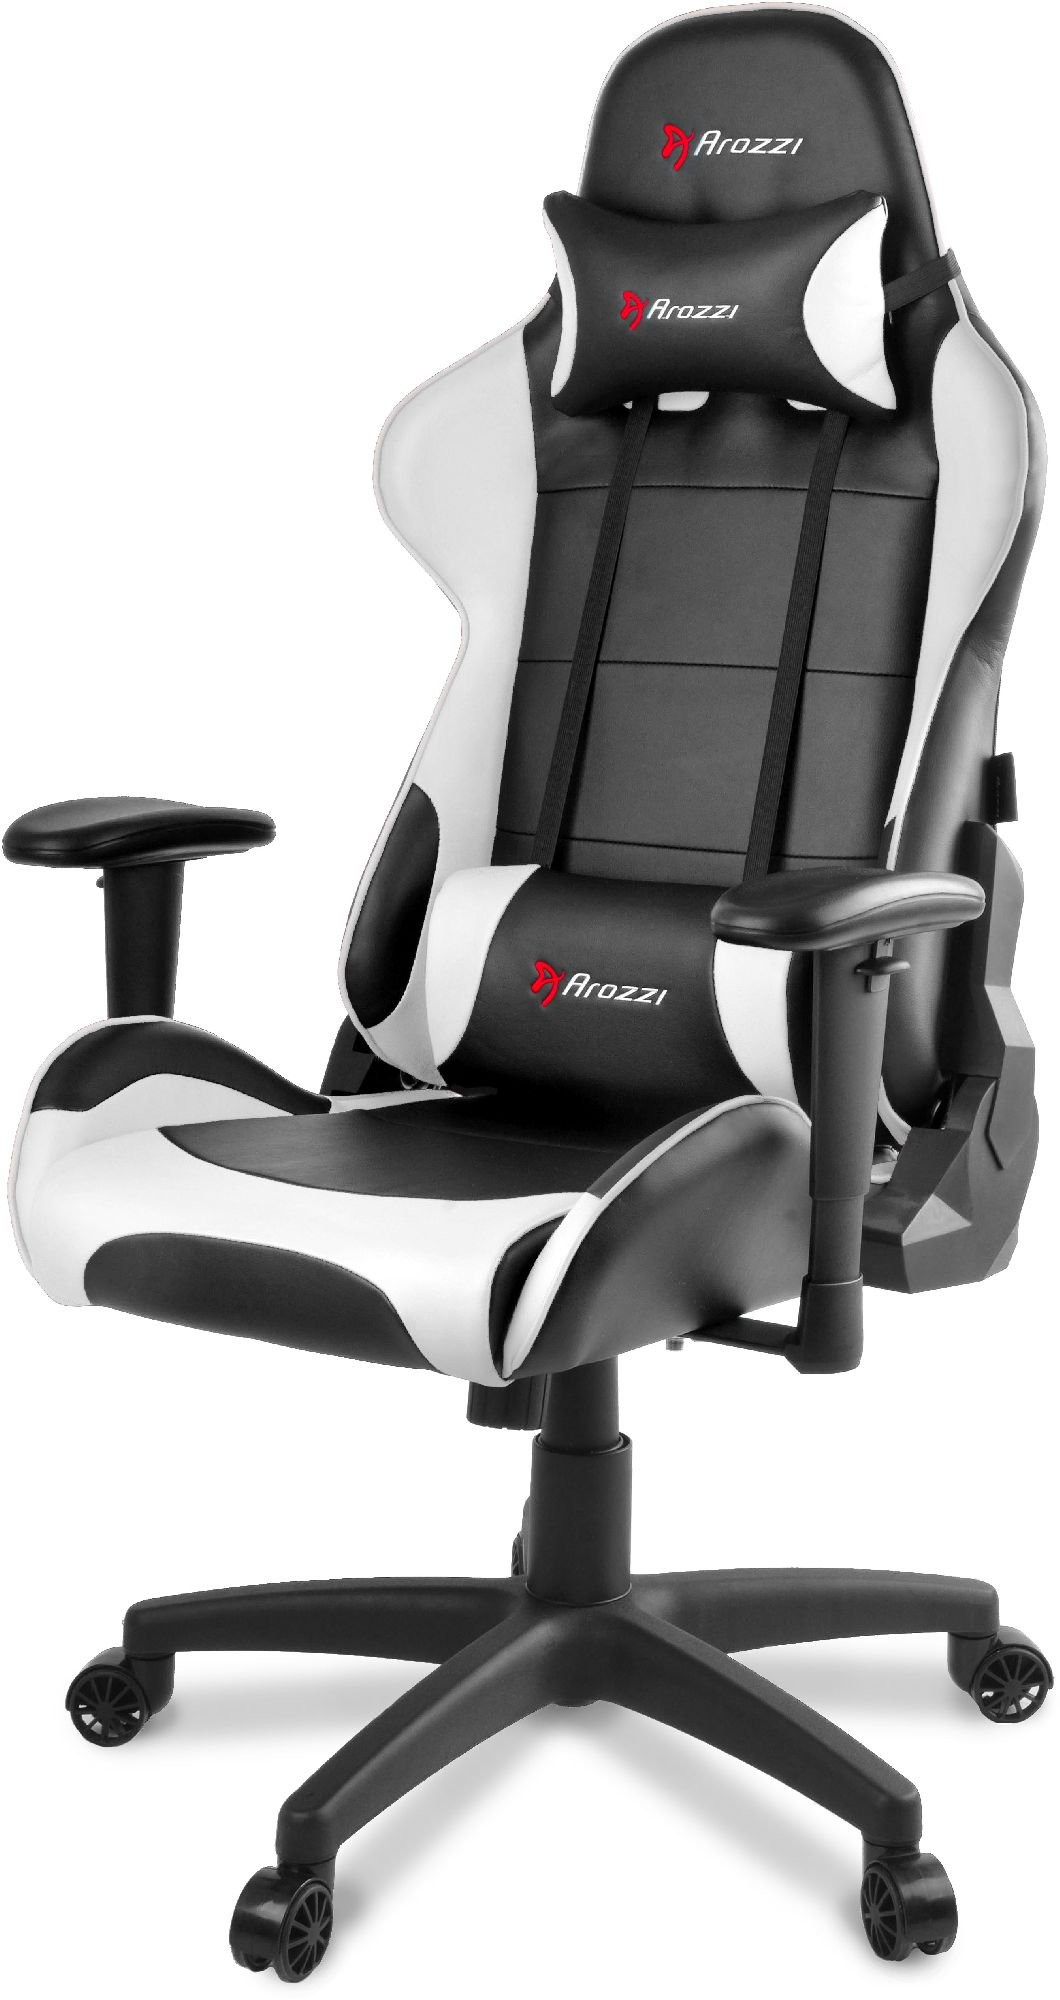 AROZZI Arozzi Verona Gaming Chair V2 VERONA-V2-WT black/white